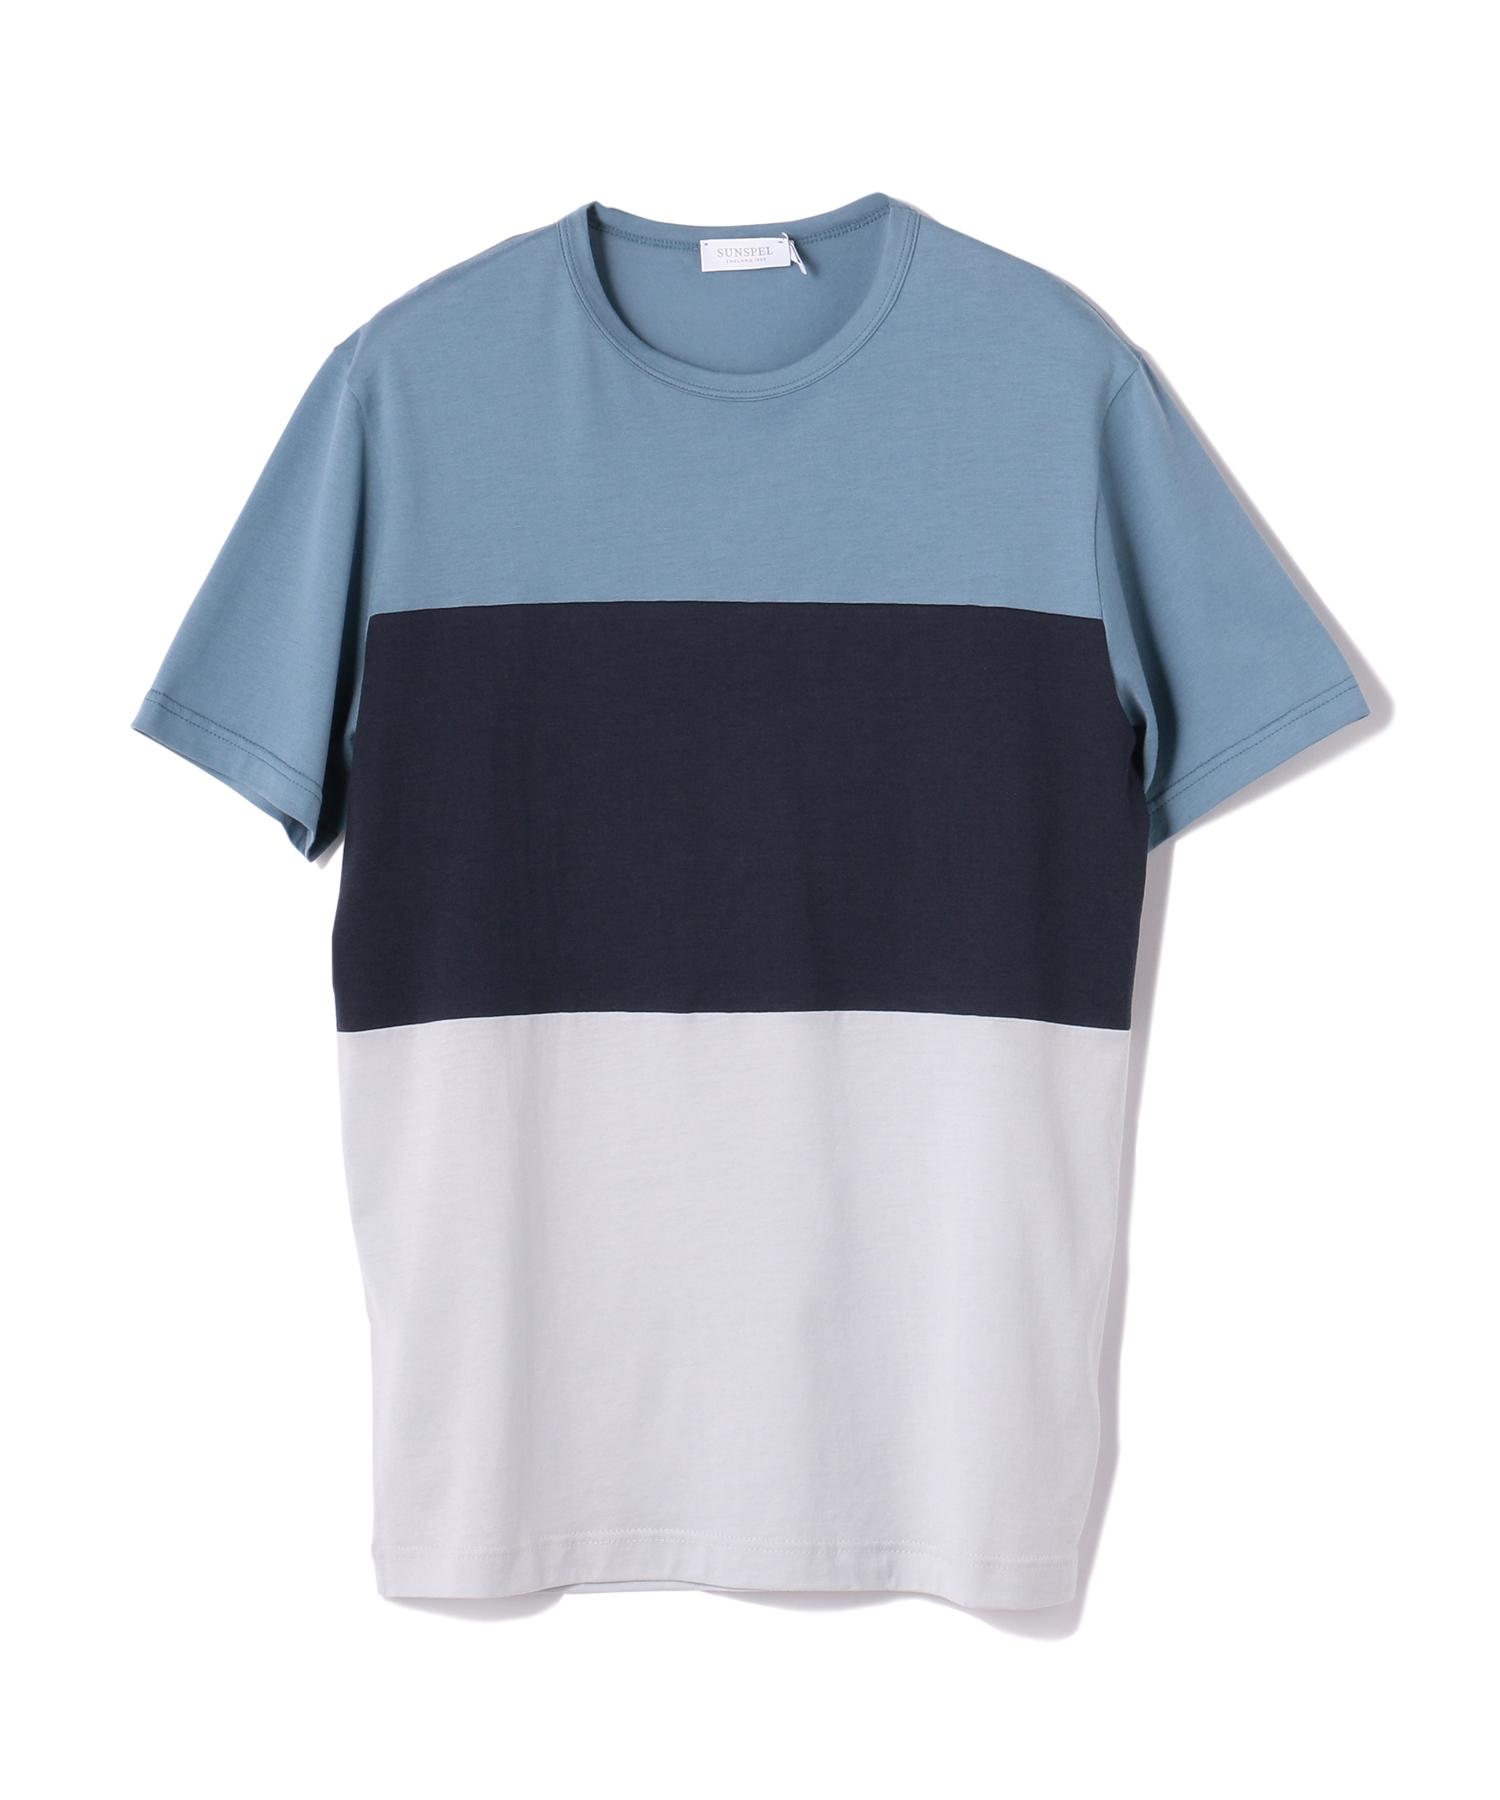 SUNSPEL / カラーブロッキングTシャツ